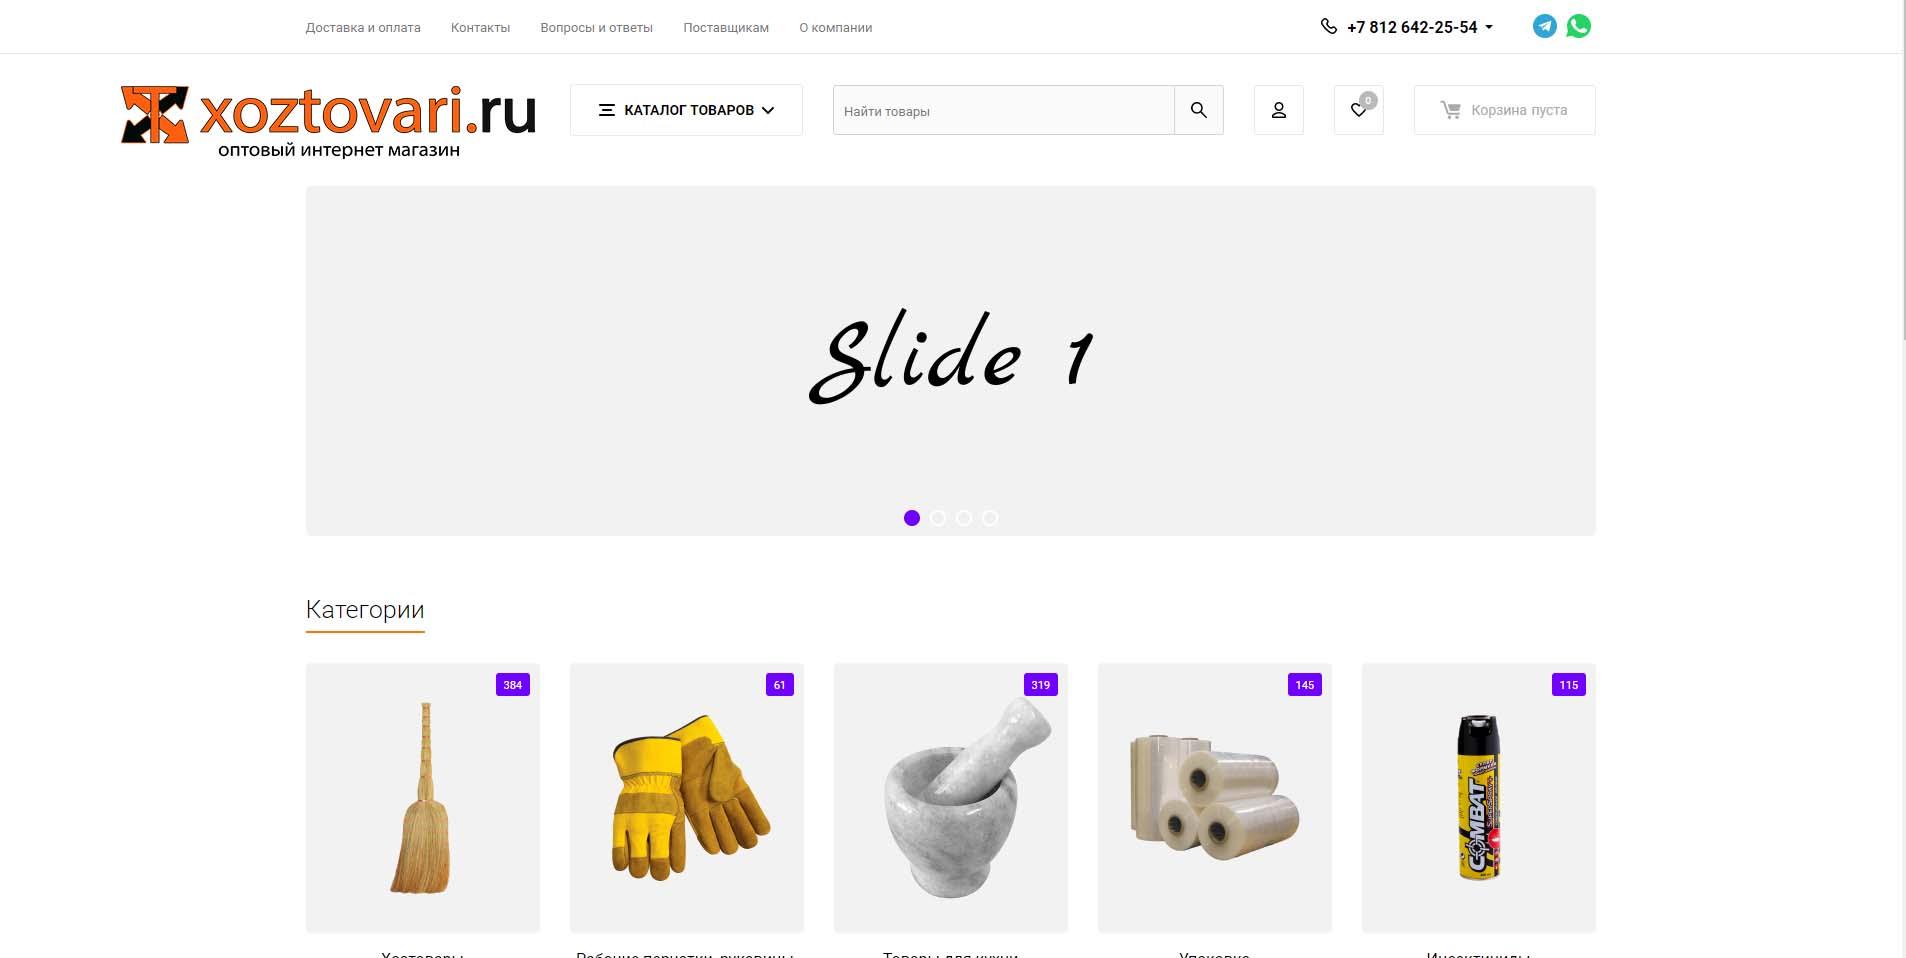 Разработка логотипа для оптового интернет-магазина «Хозтовары.ру» фото f_33160741e8284fb6.jpg